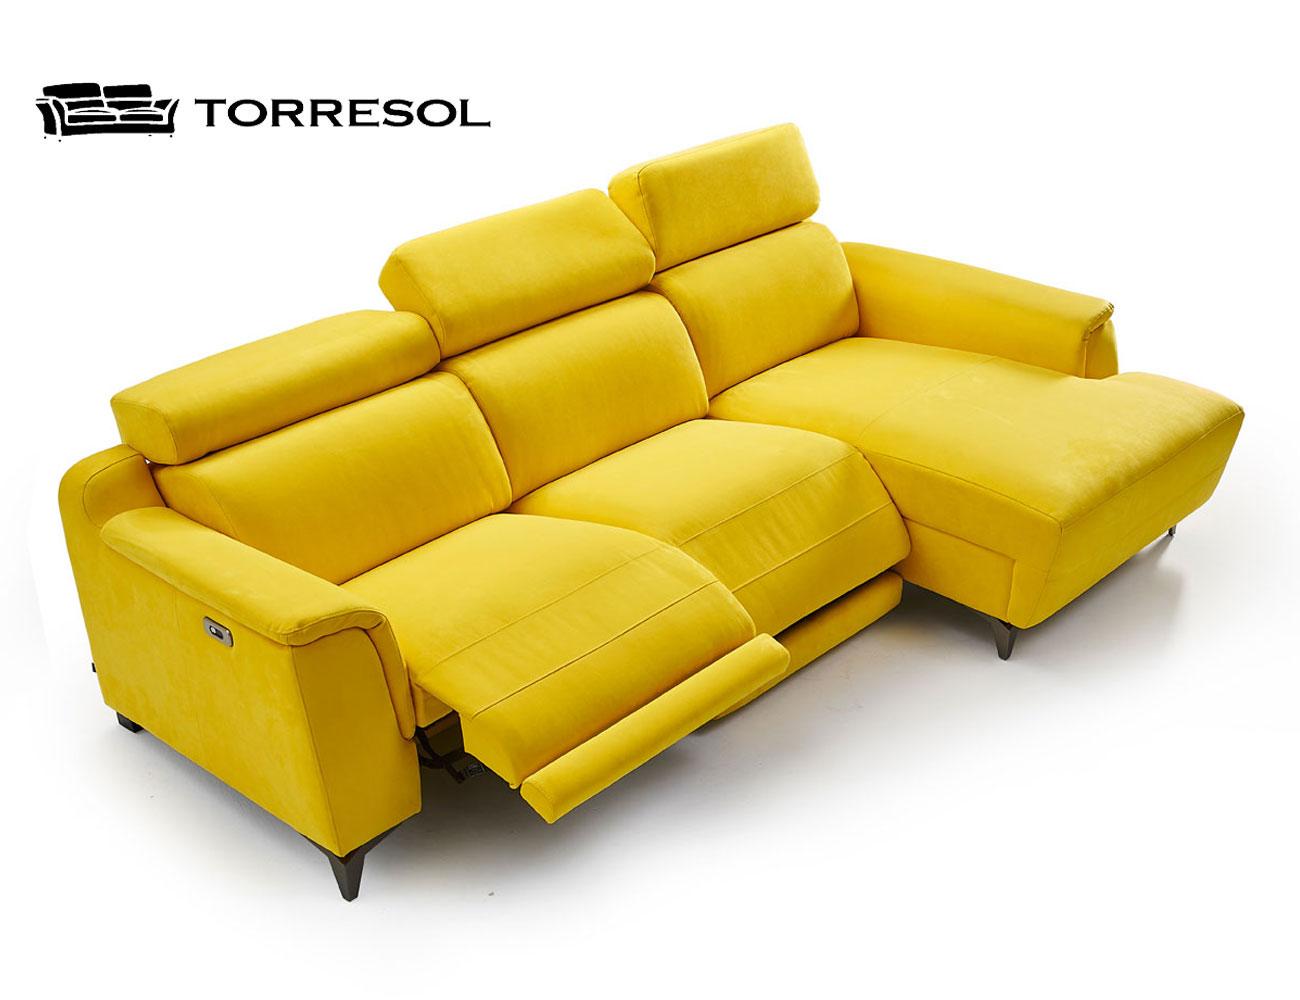 Sofa ralph torresol 21